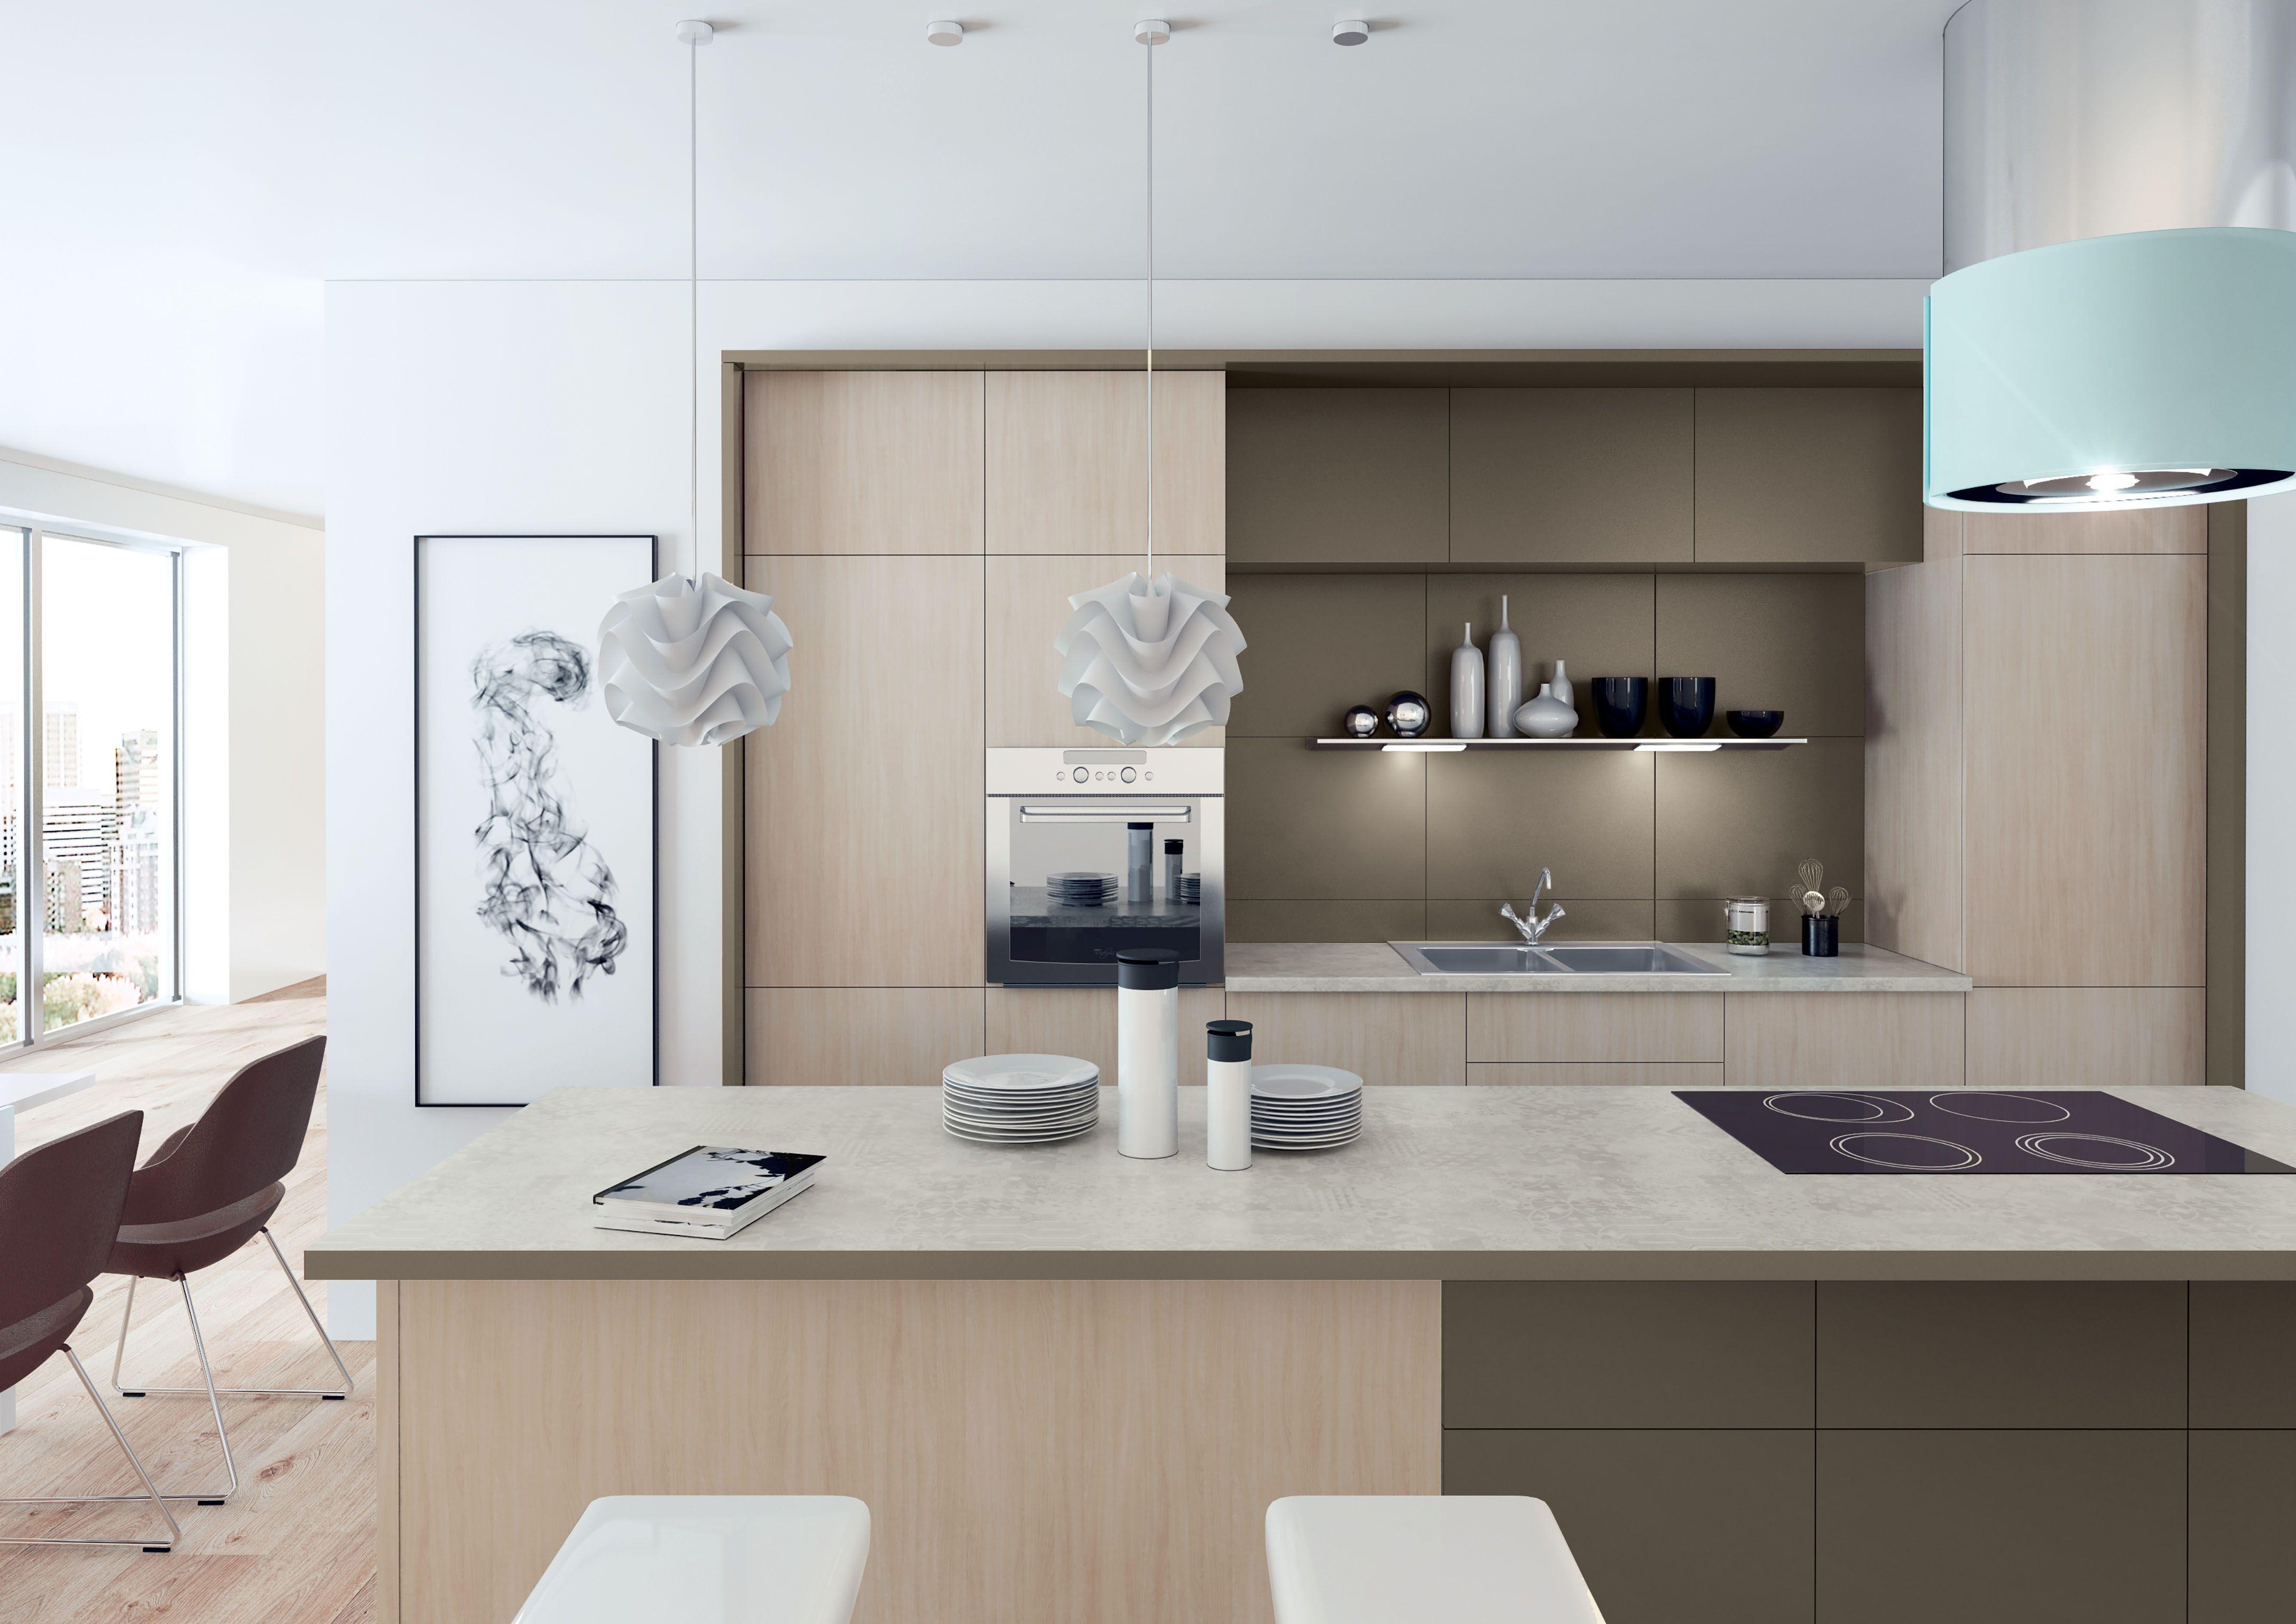 Blat Kuchenny Swiss Krono D4881 Bs Dubaj Jasny Home Decor Interior Decor